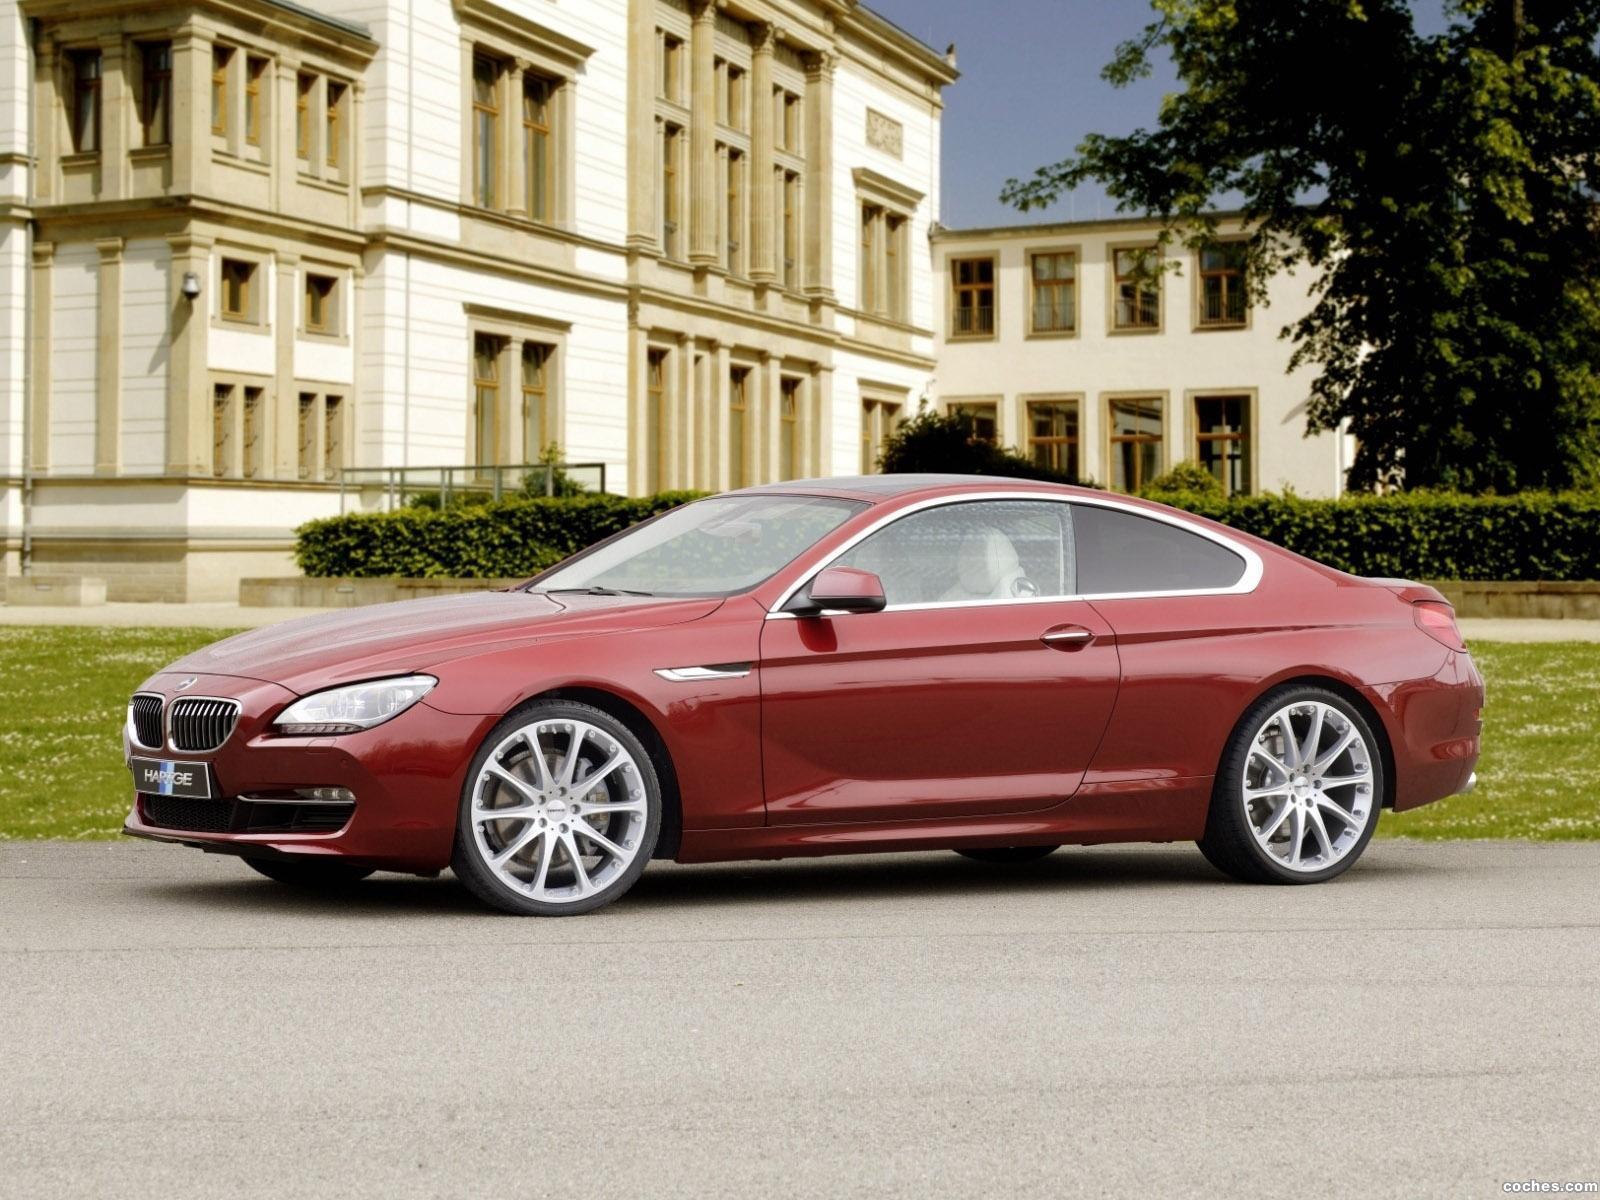 Foto 0 de Hartge BMW Serie 6 Coupe 2012